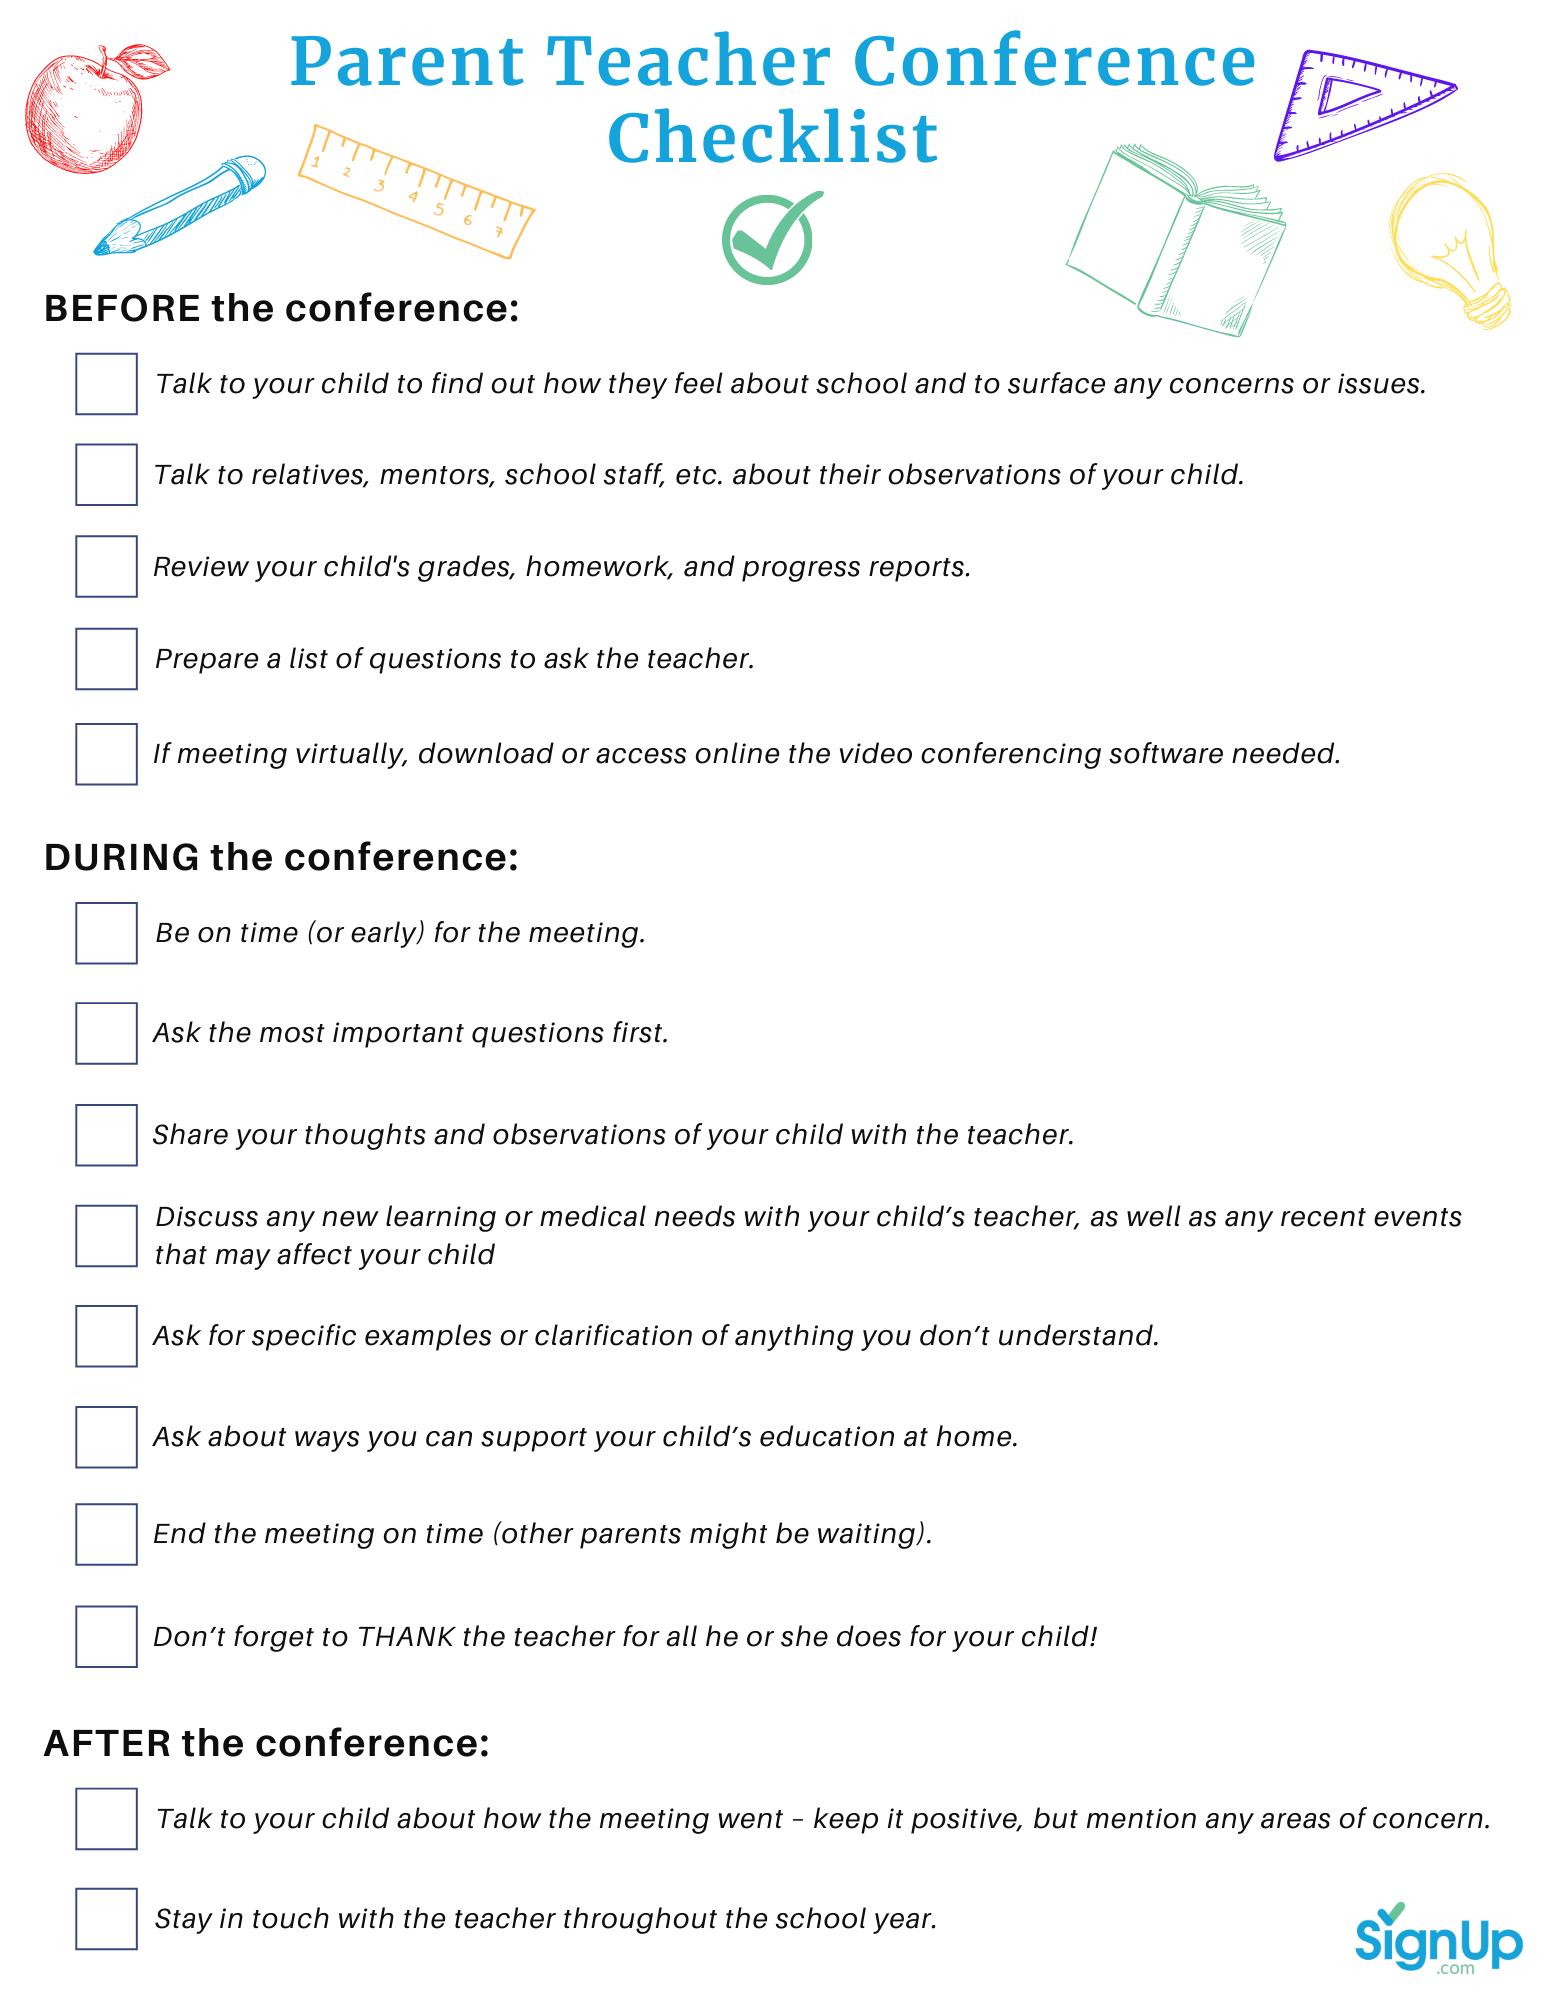 Best Parent Teacher Conference Scheduling Software